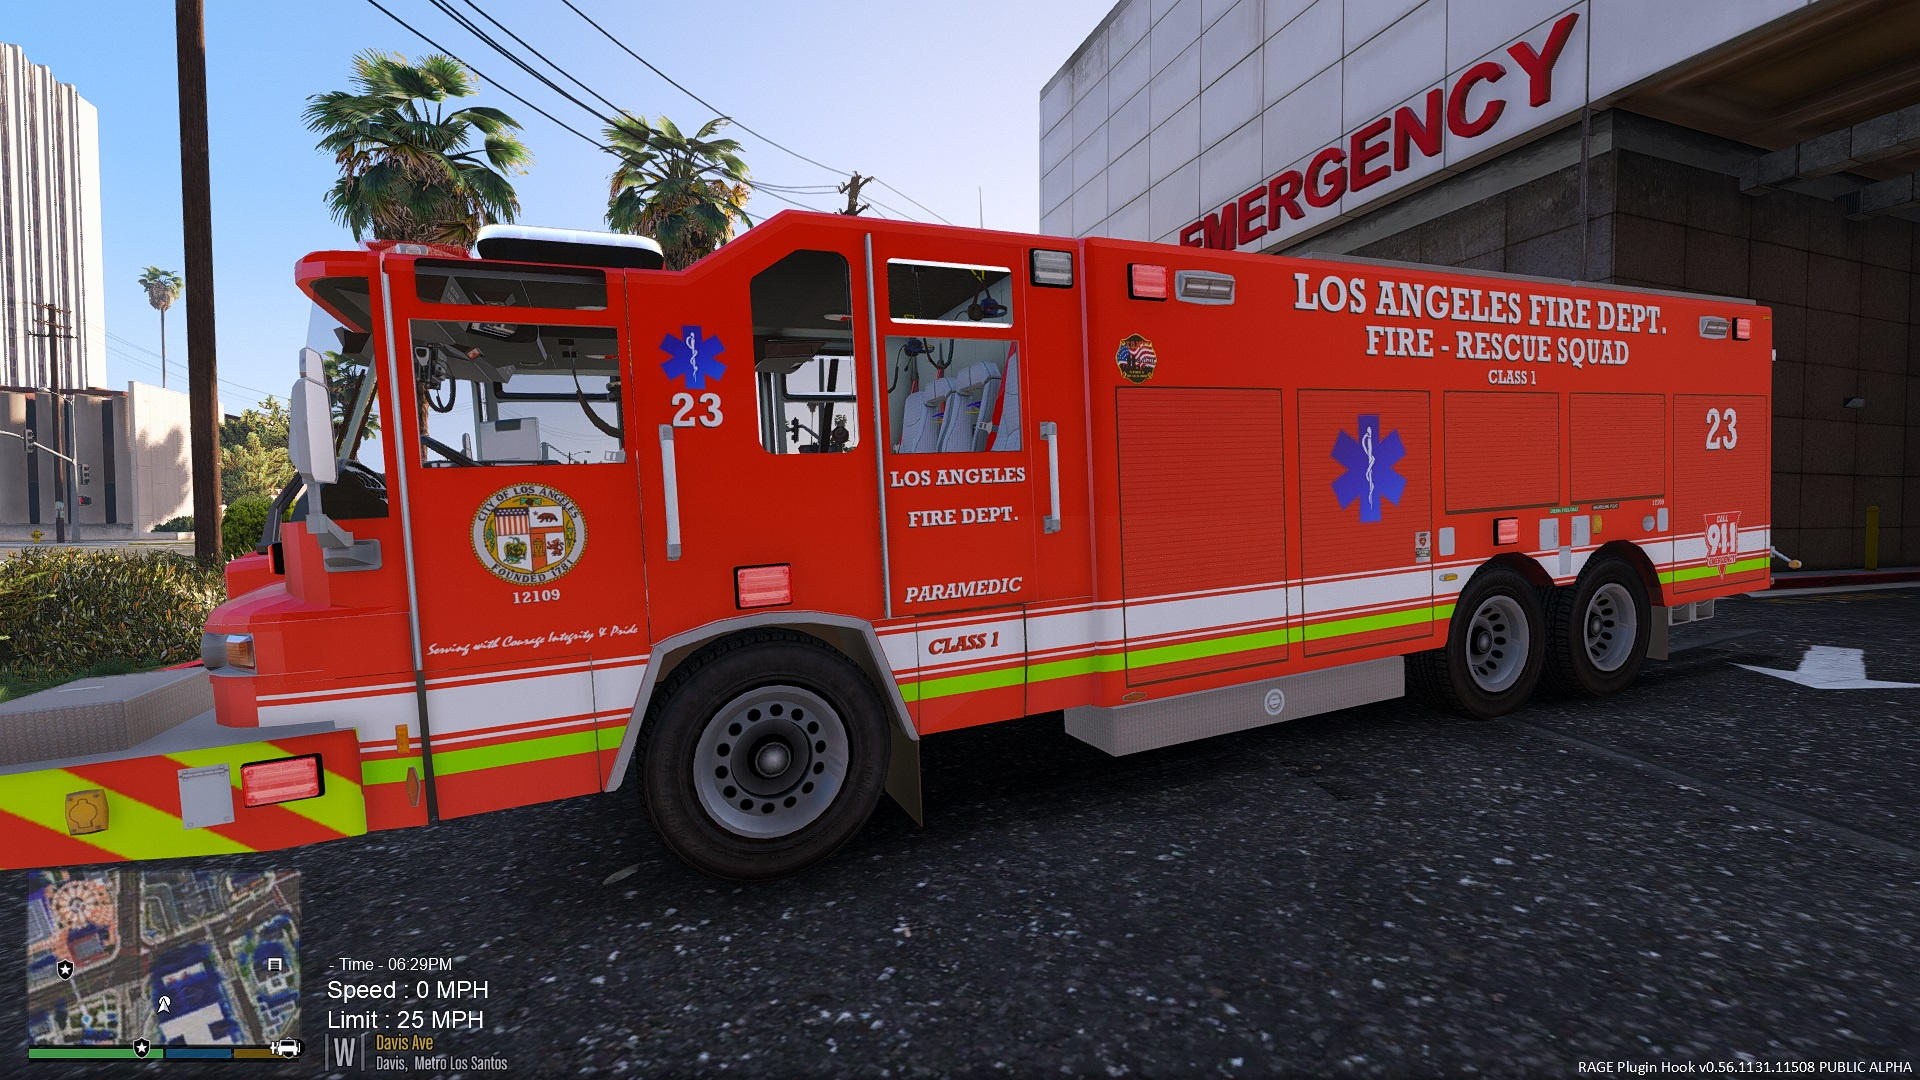 [4K] Pierce Quantum Fire - Rescue Squad [Metal or Painted ...